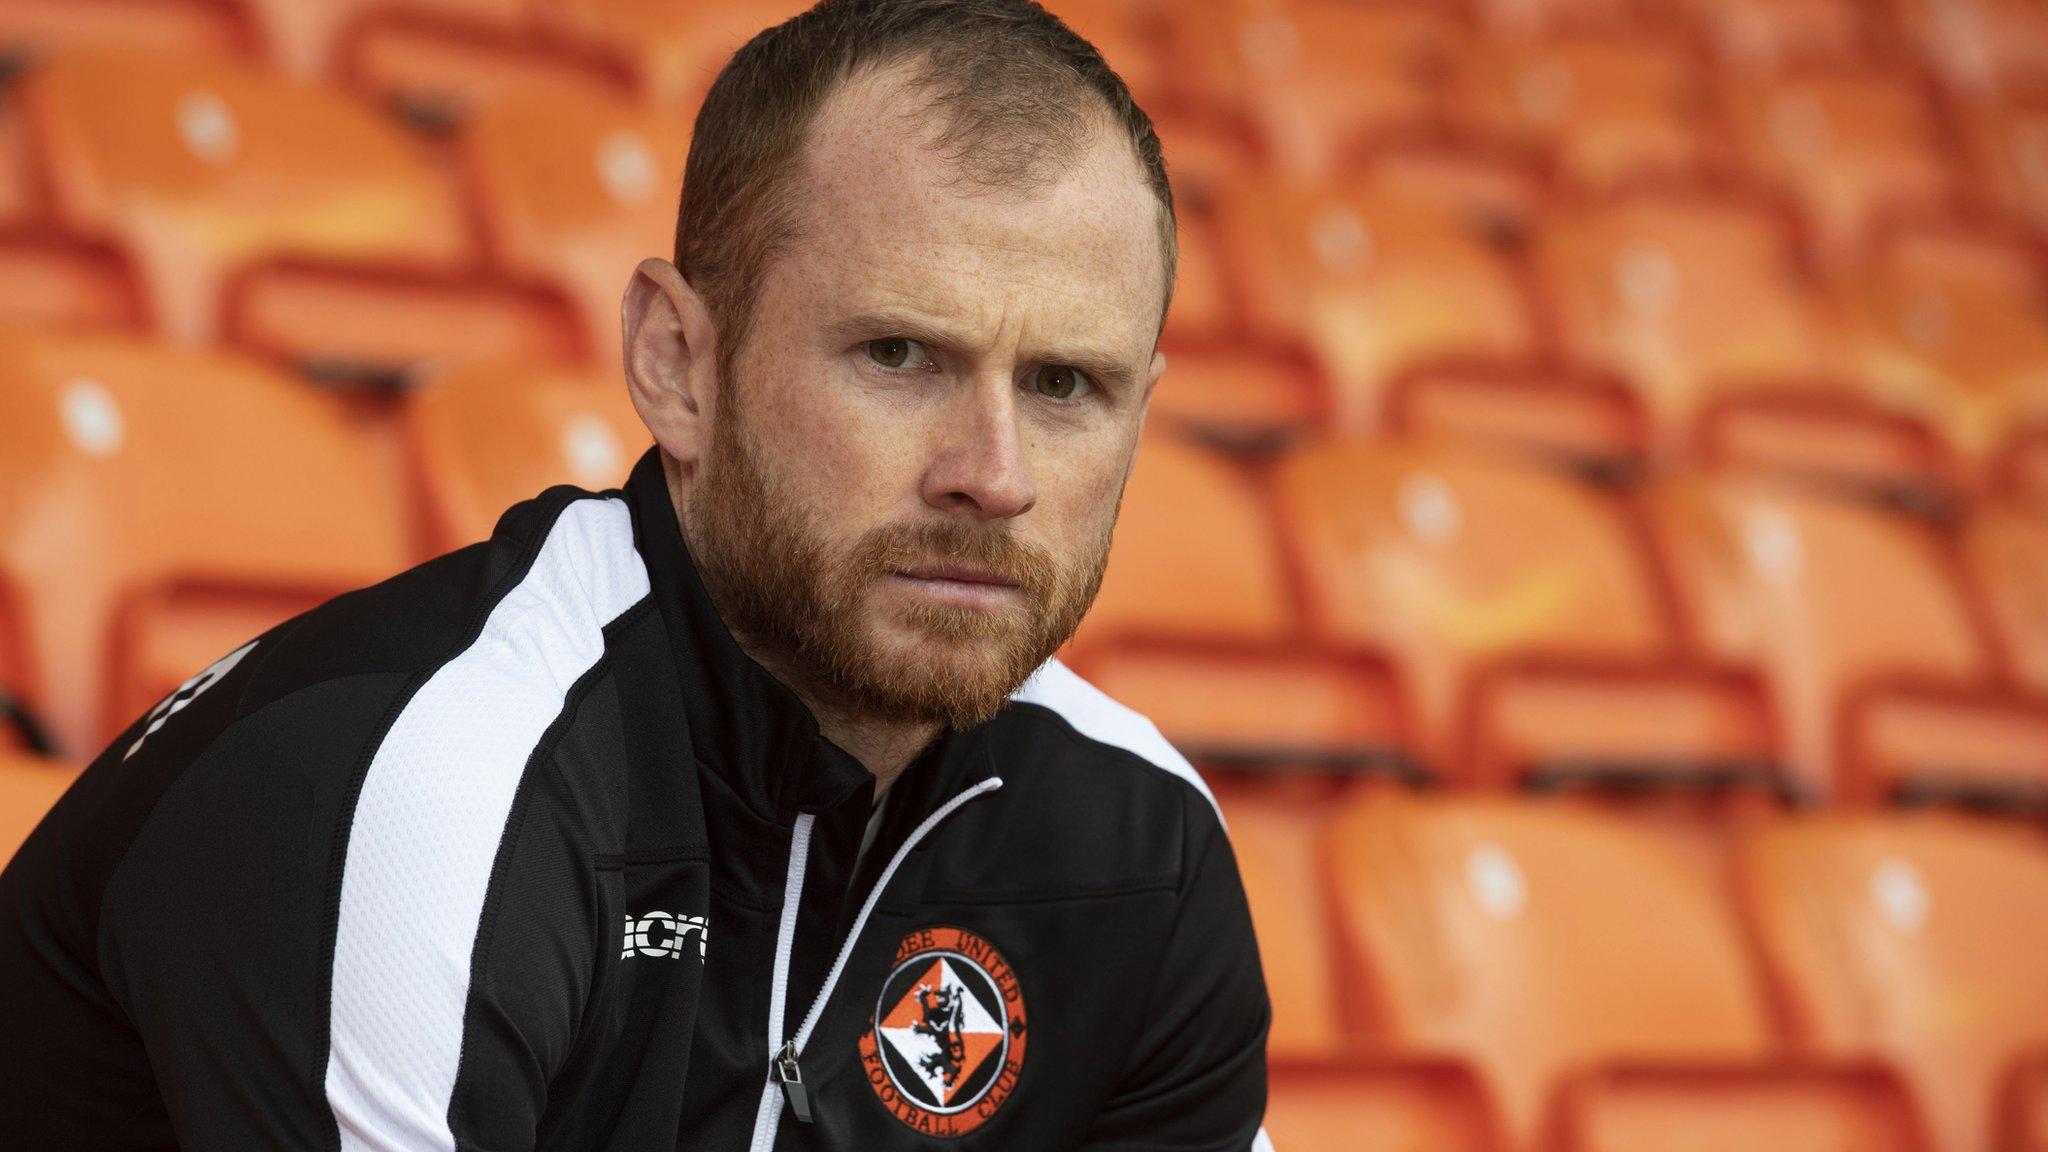 Mark Reynolds: Dundee United's new graduate says footballer students no longer 'pariahs'